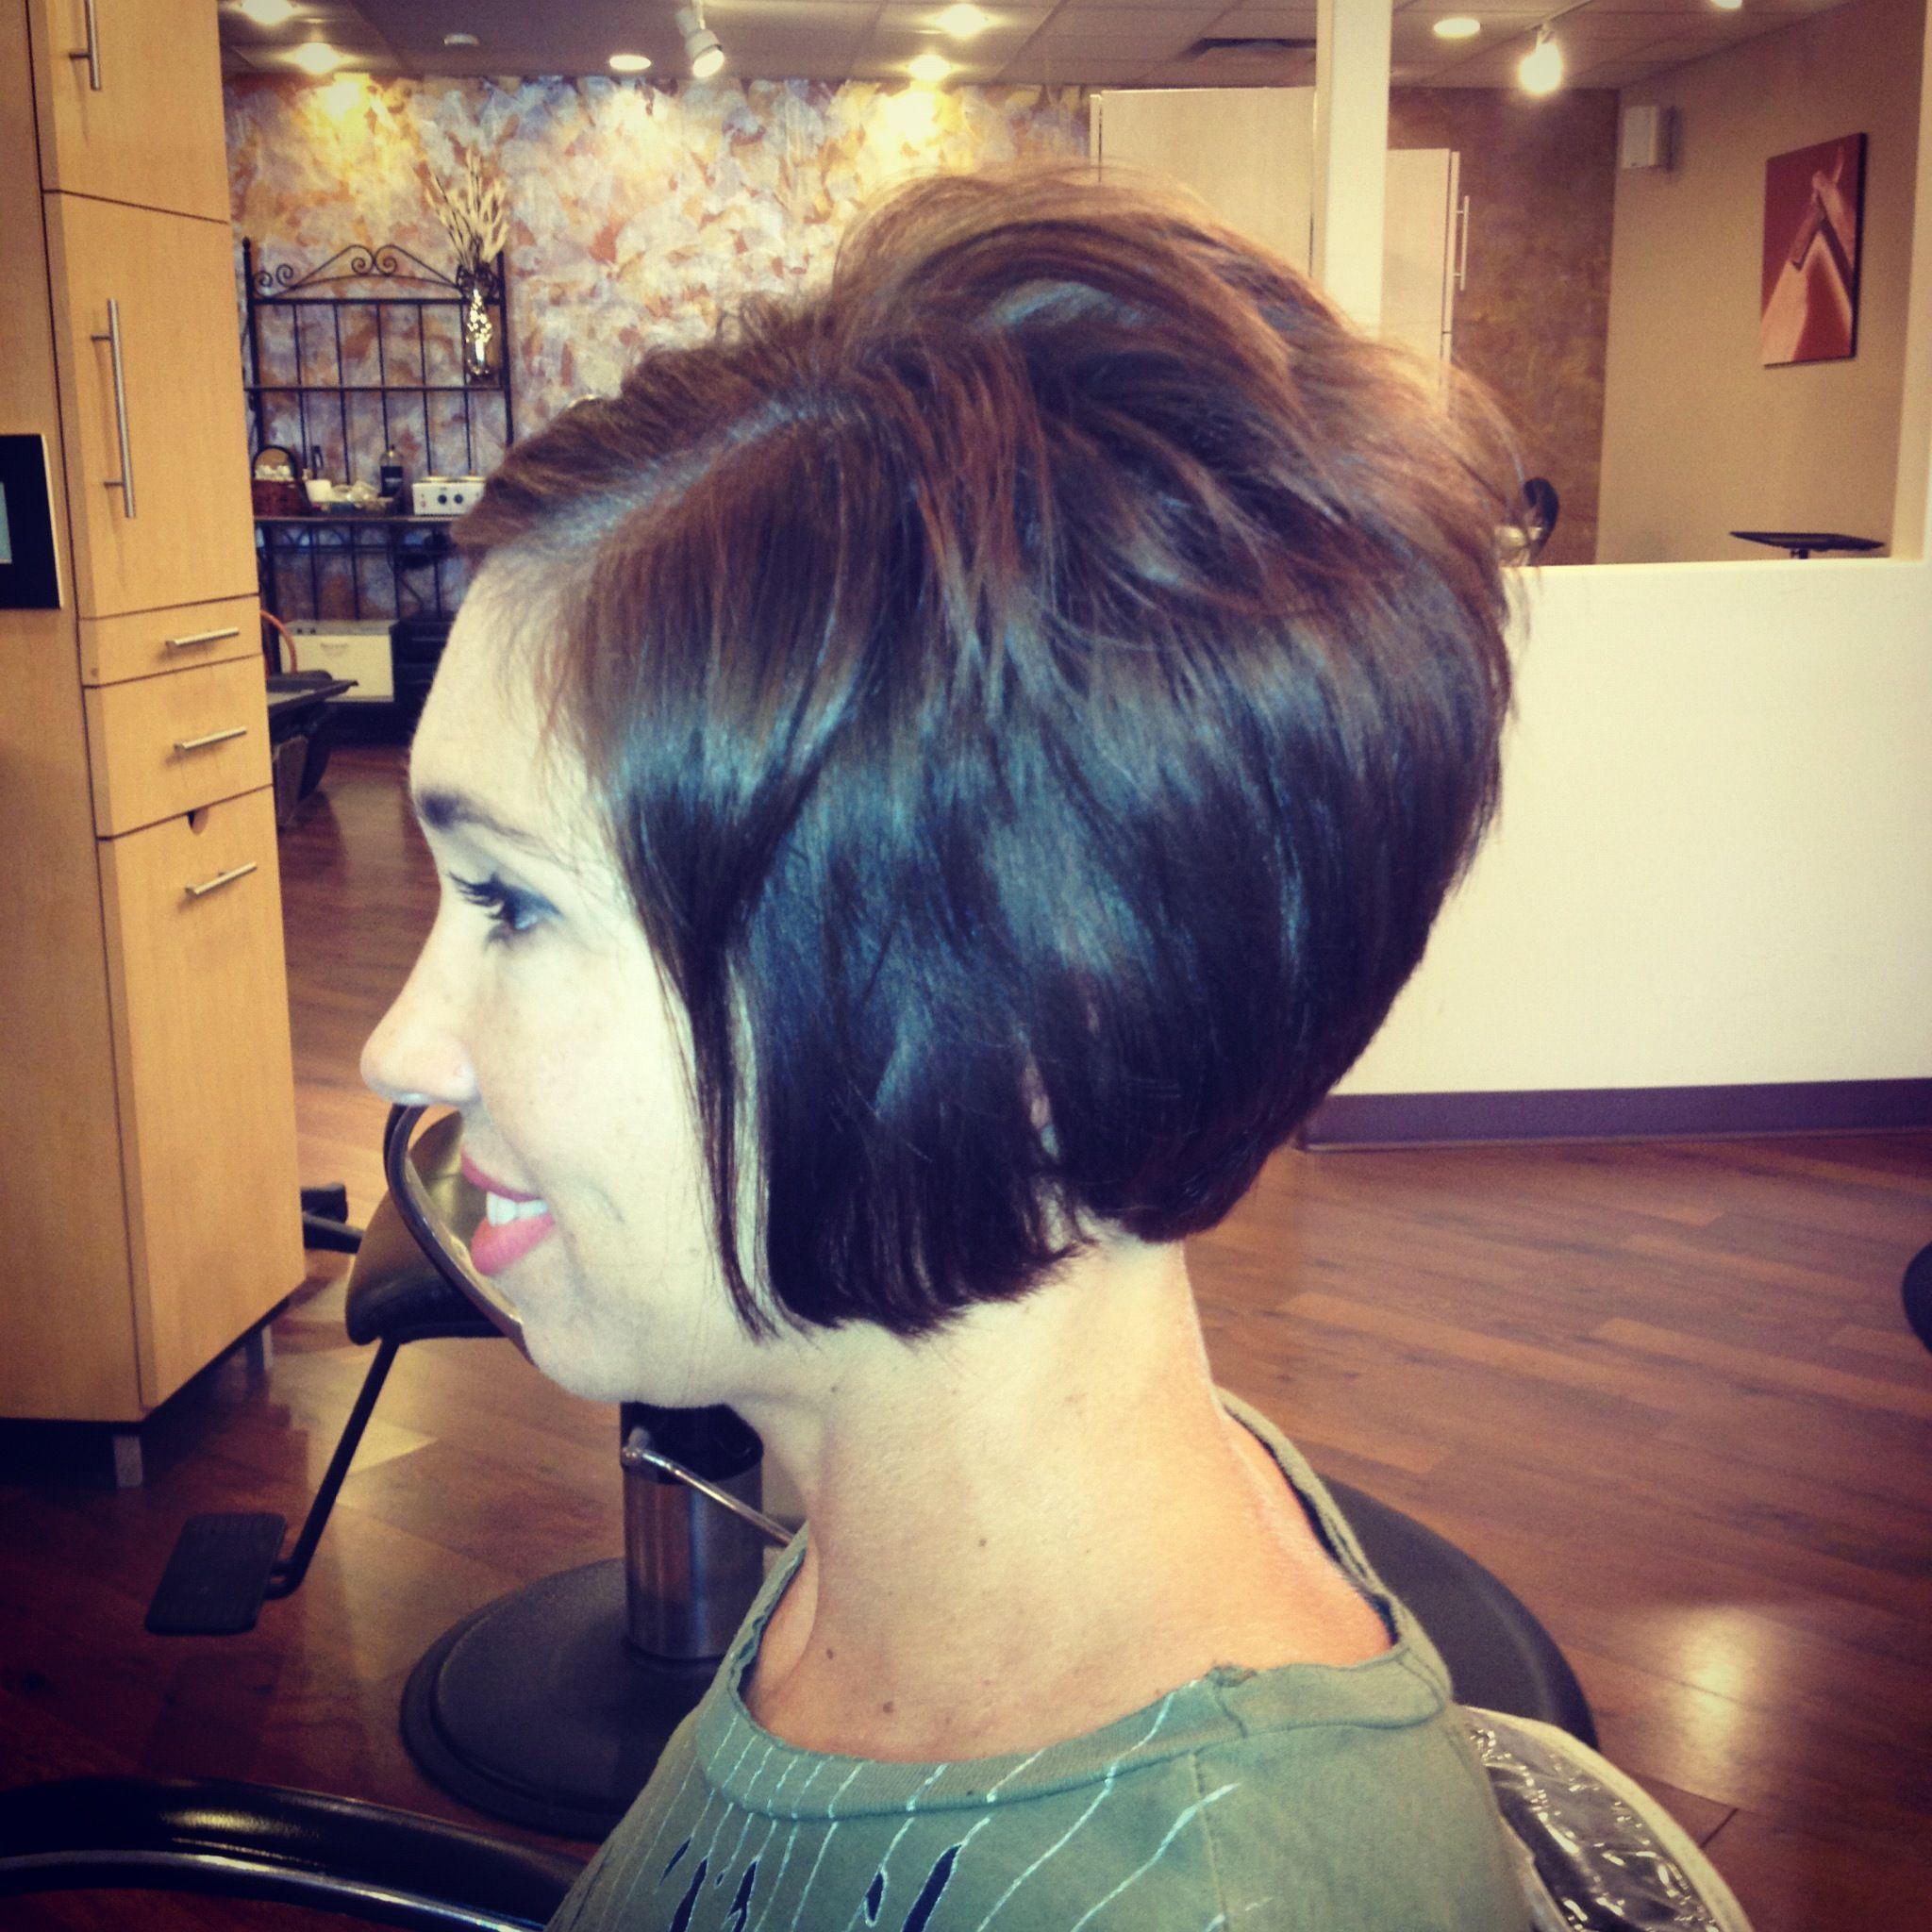 Surprising Short Stacked Bob Haircut By Debbie At Encounters Salon Haircut Short Hairstyles For Black Women Fulllsitofus